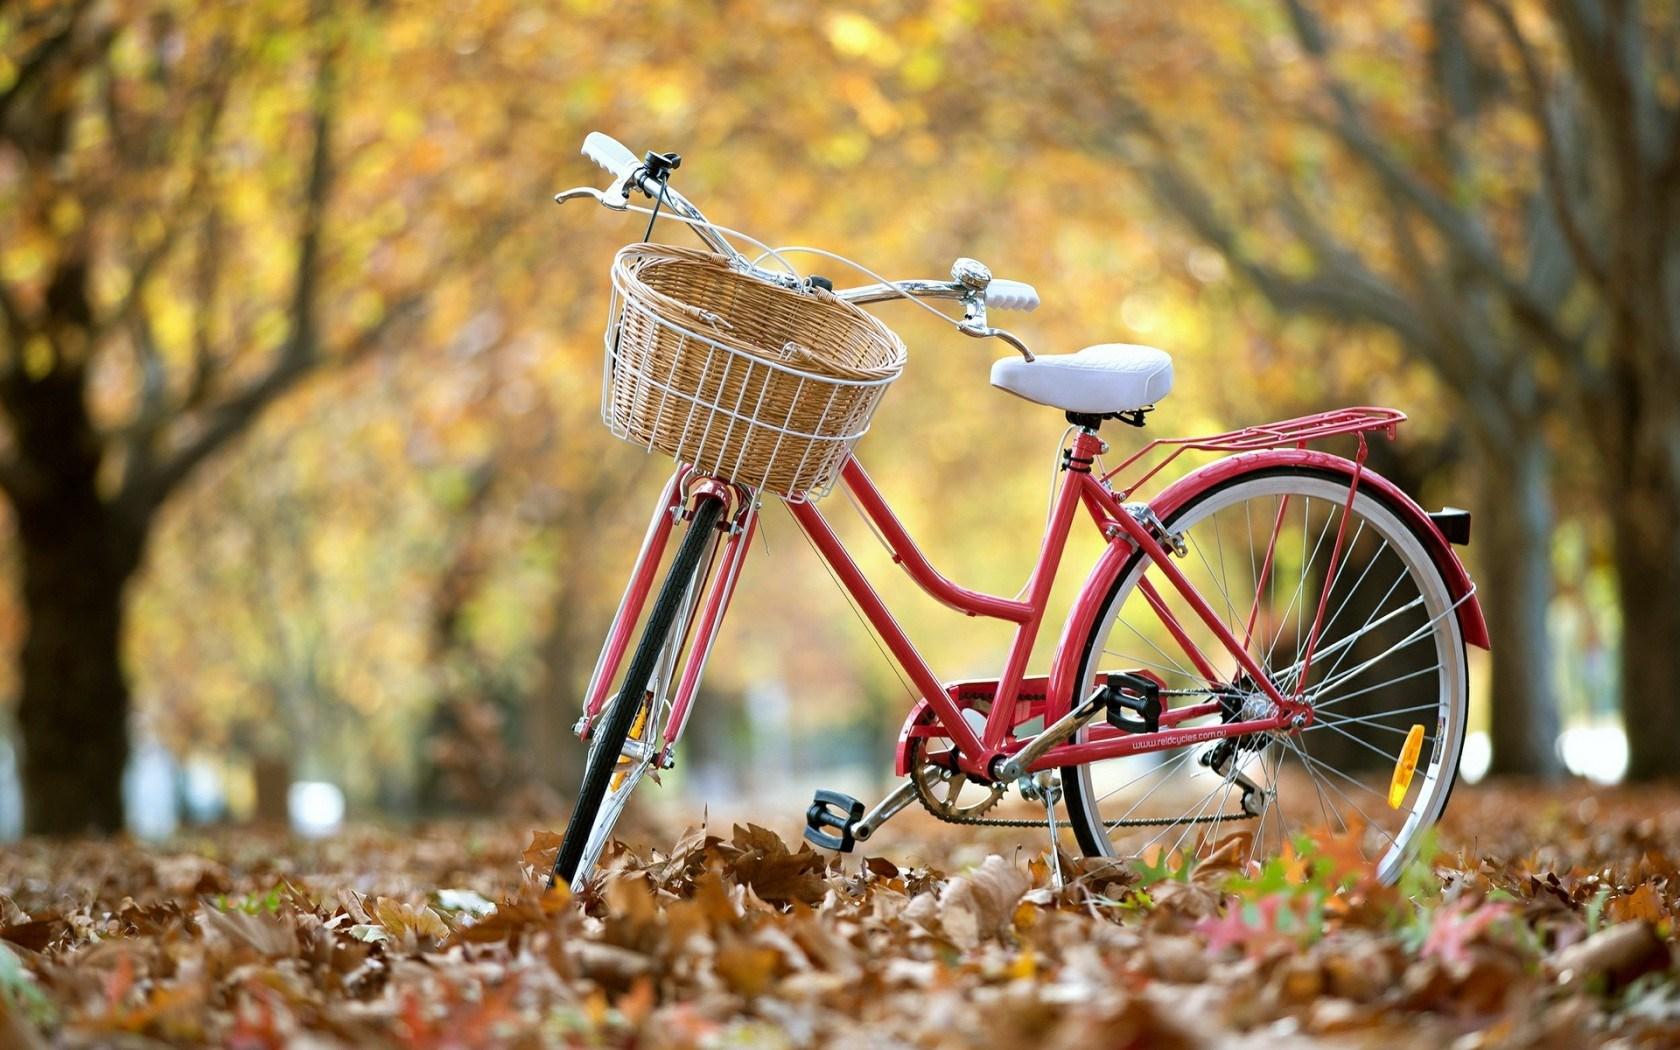 Beautiful Love Wallpapers For Mobile: 3 Cuidados A Ter Para Andar De Bicicleta No Outono